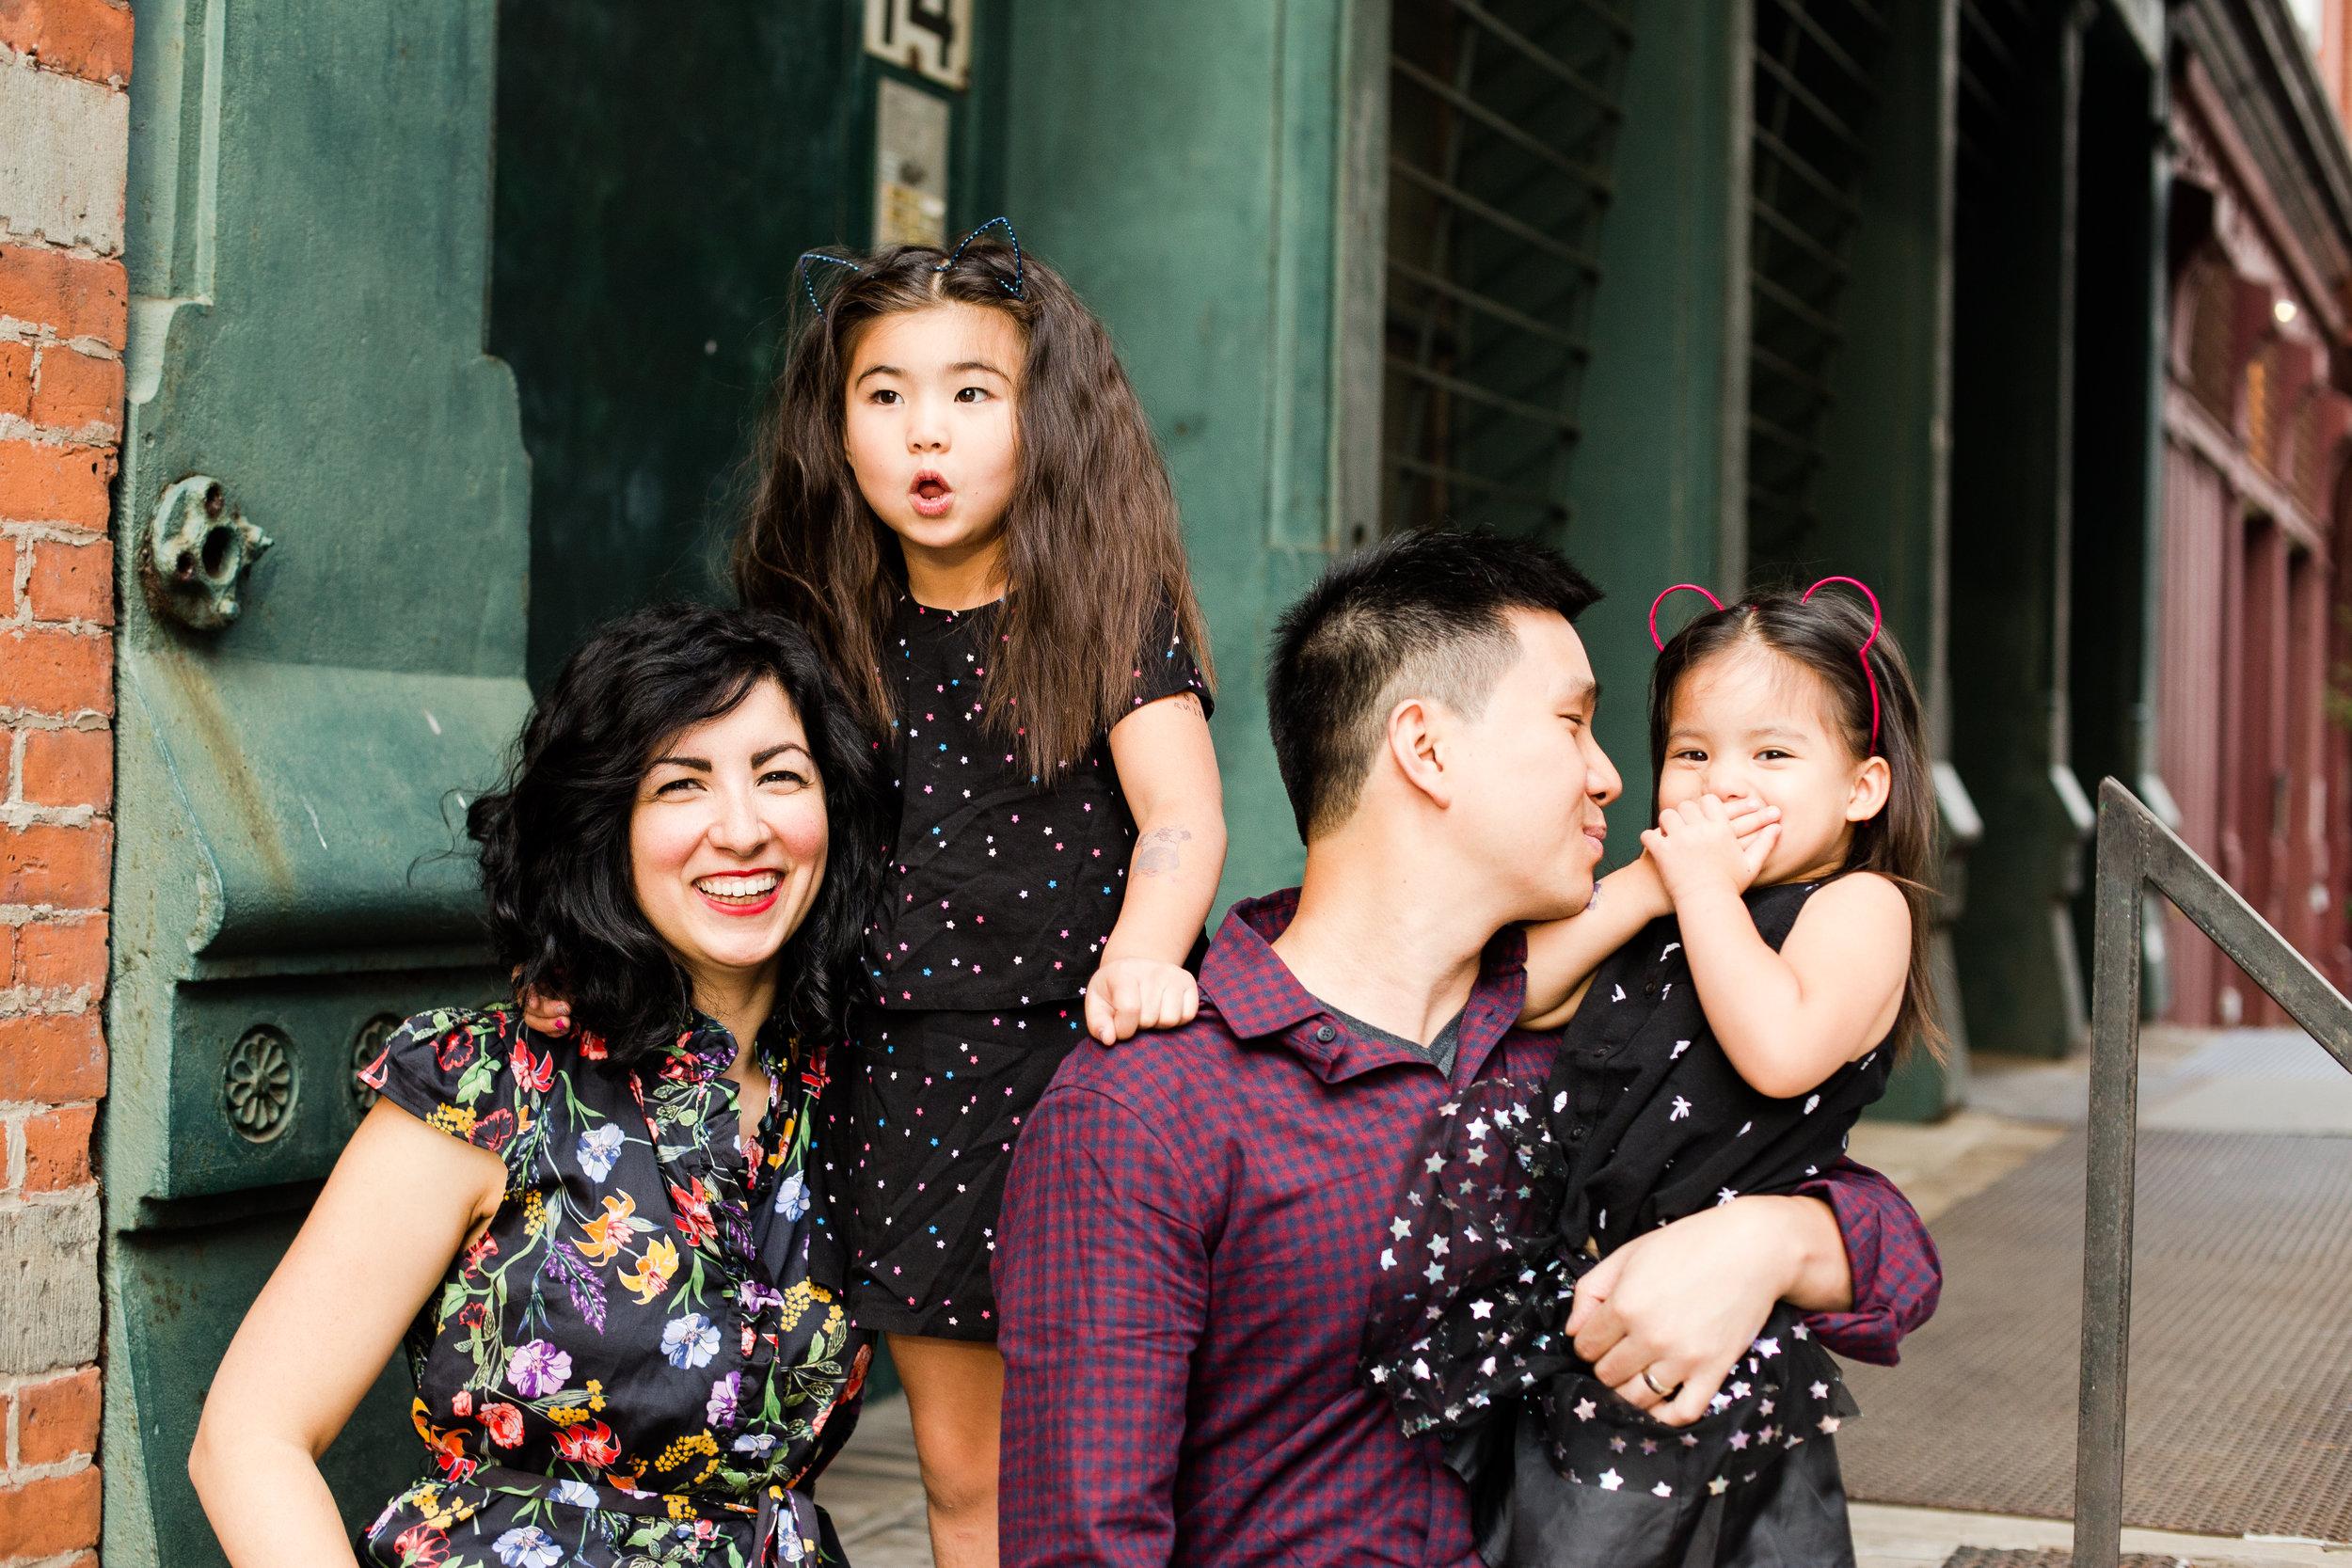 lissiephoto_loomis_nyc_family_photography24.JPG